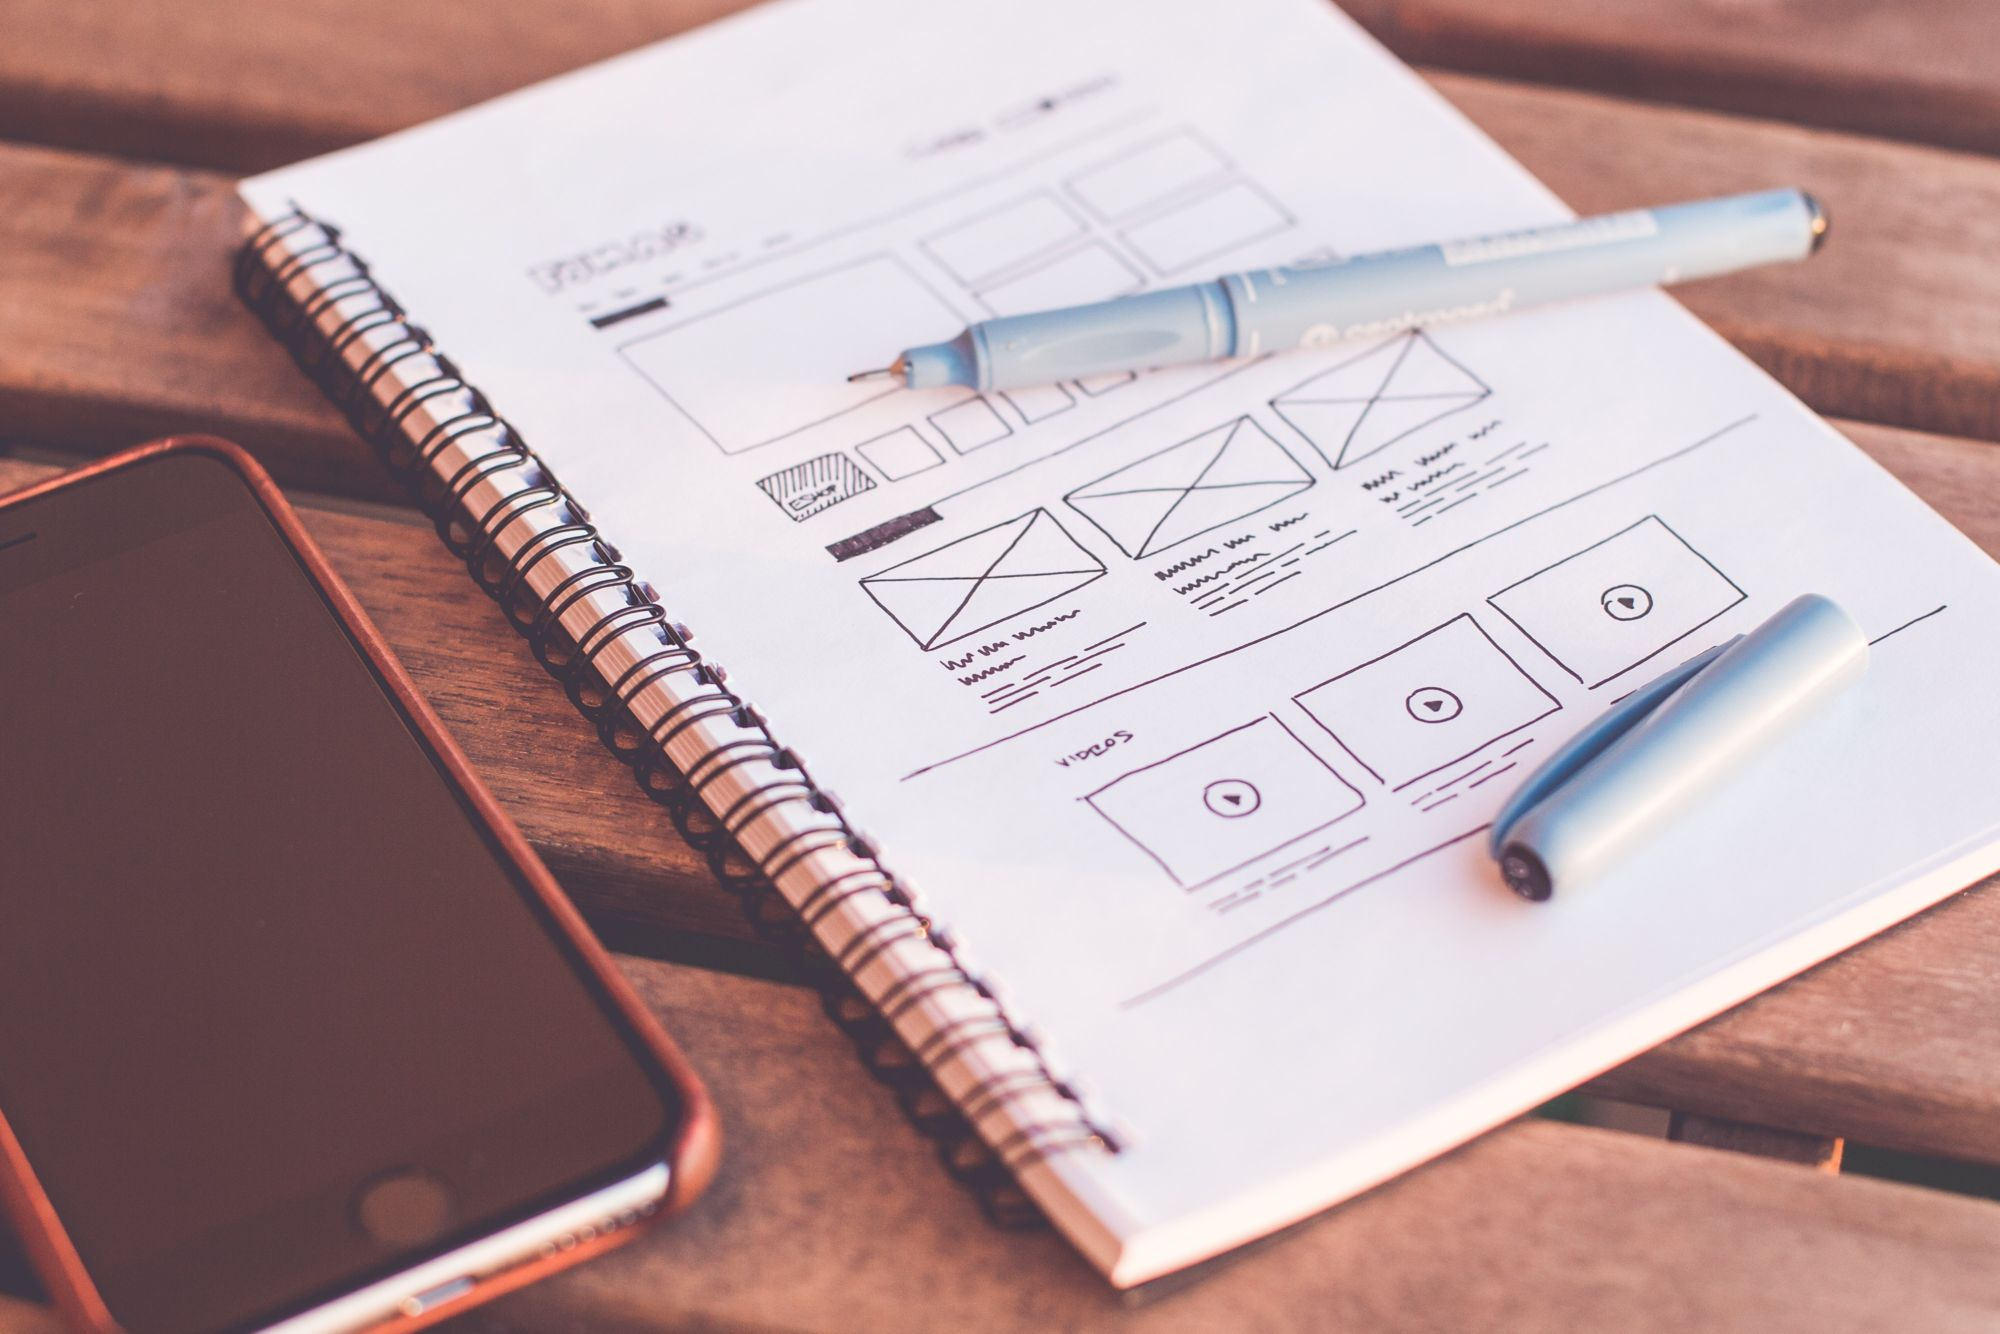 Minimalismus při tvorbě webu